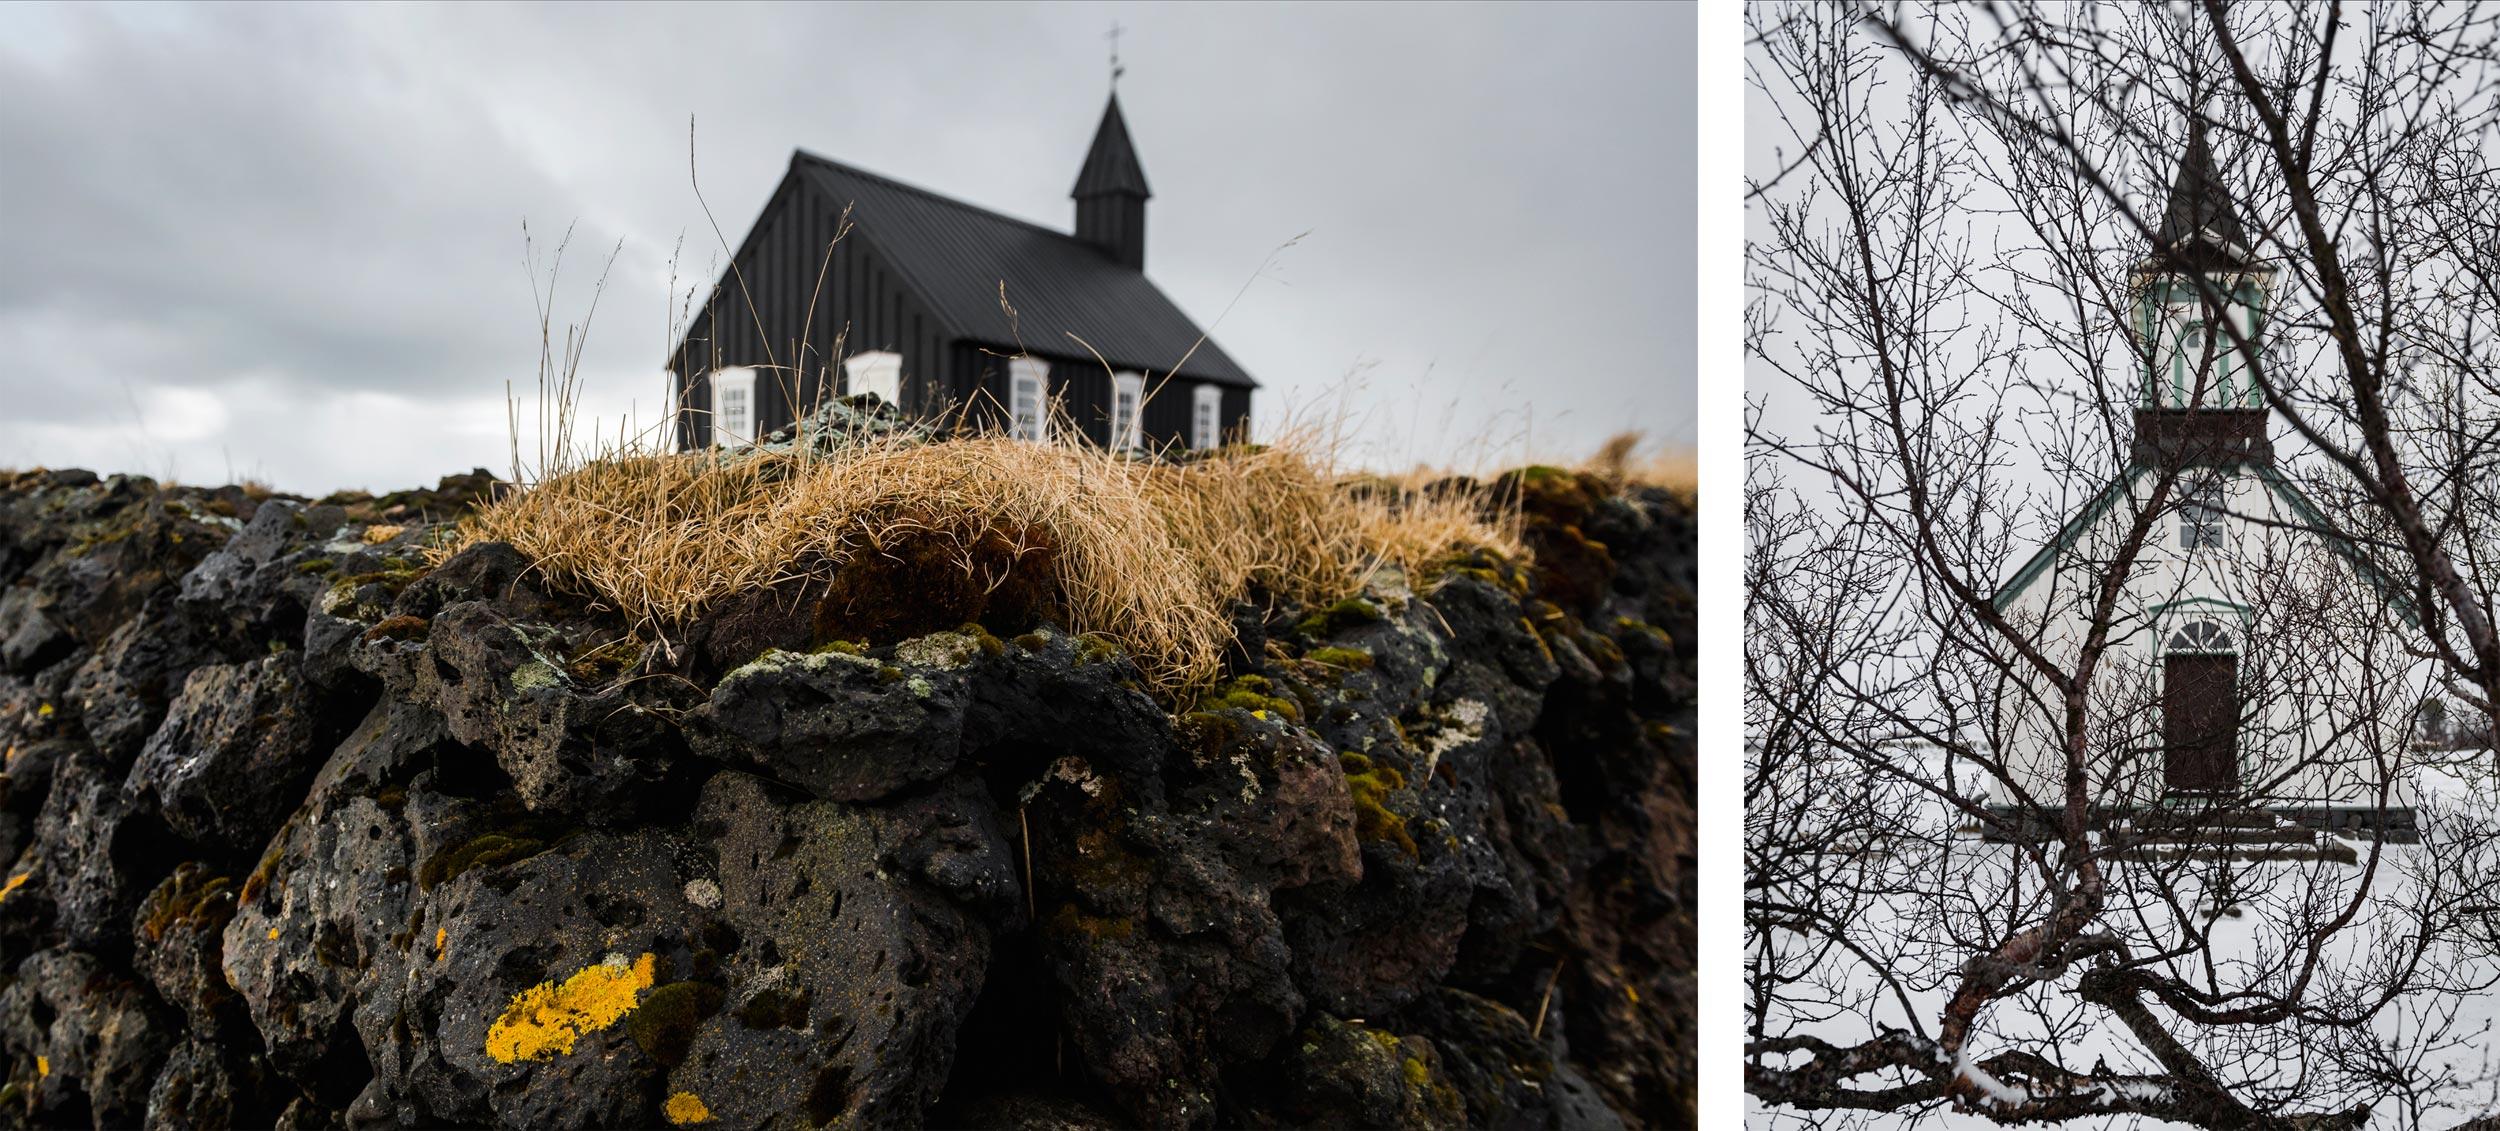 Voyage_Islande_Hiver_Anouk-Ruffieux_08.jpg